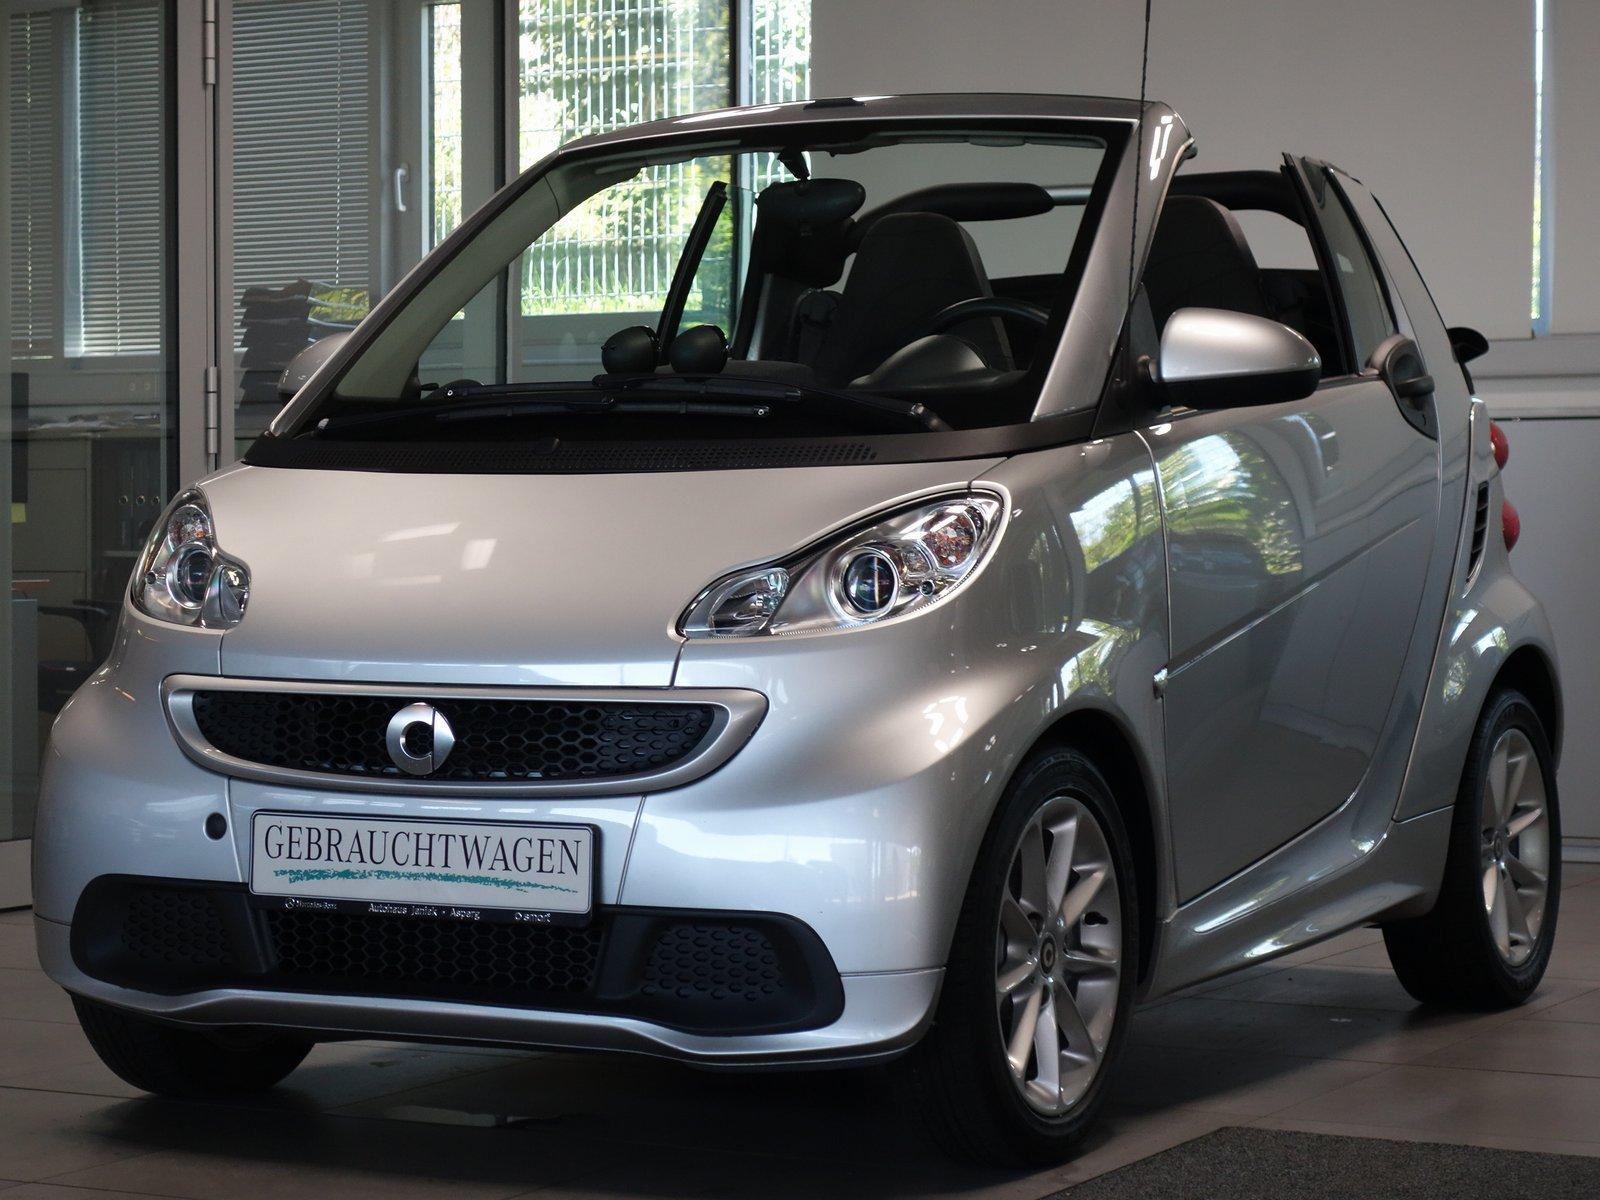 smart fortwo cabrio mhd Passion|Navi|Servo|Klima|SHZ, Jahr 2013, Benzin